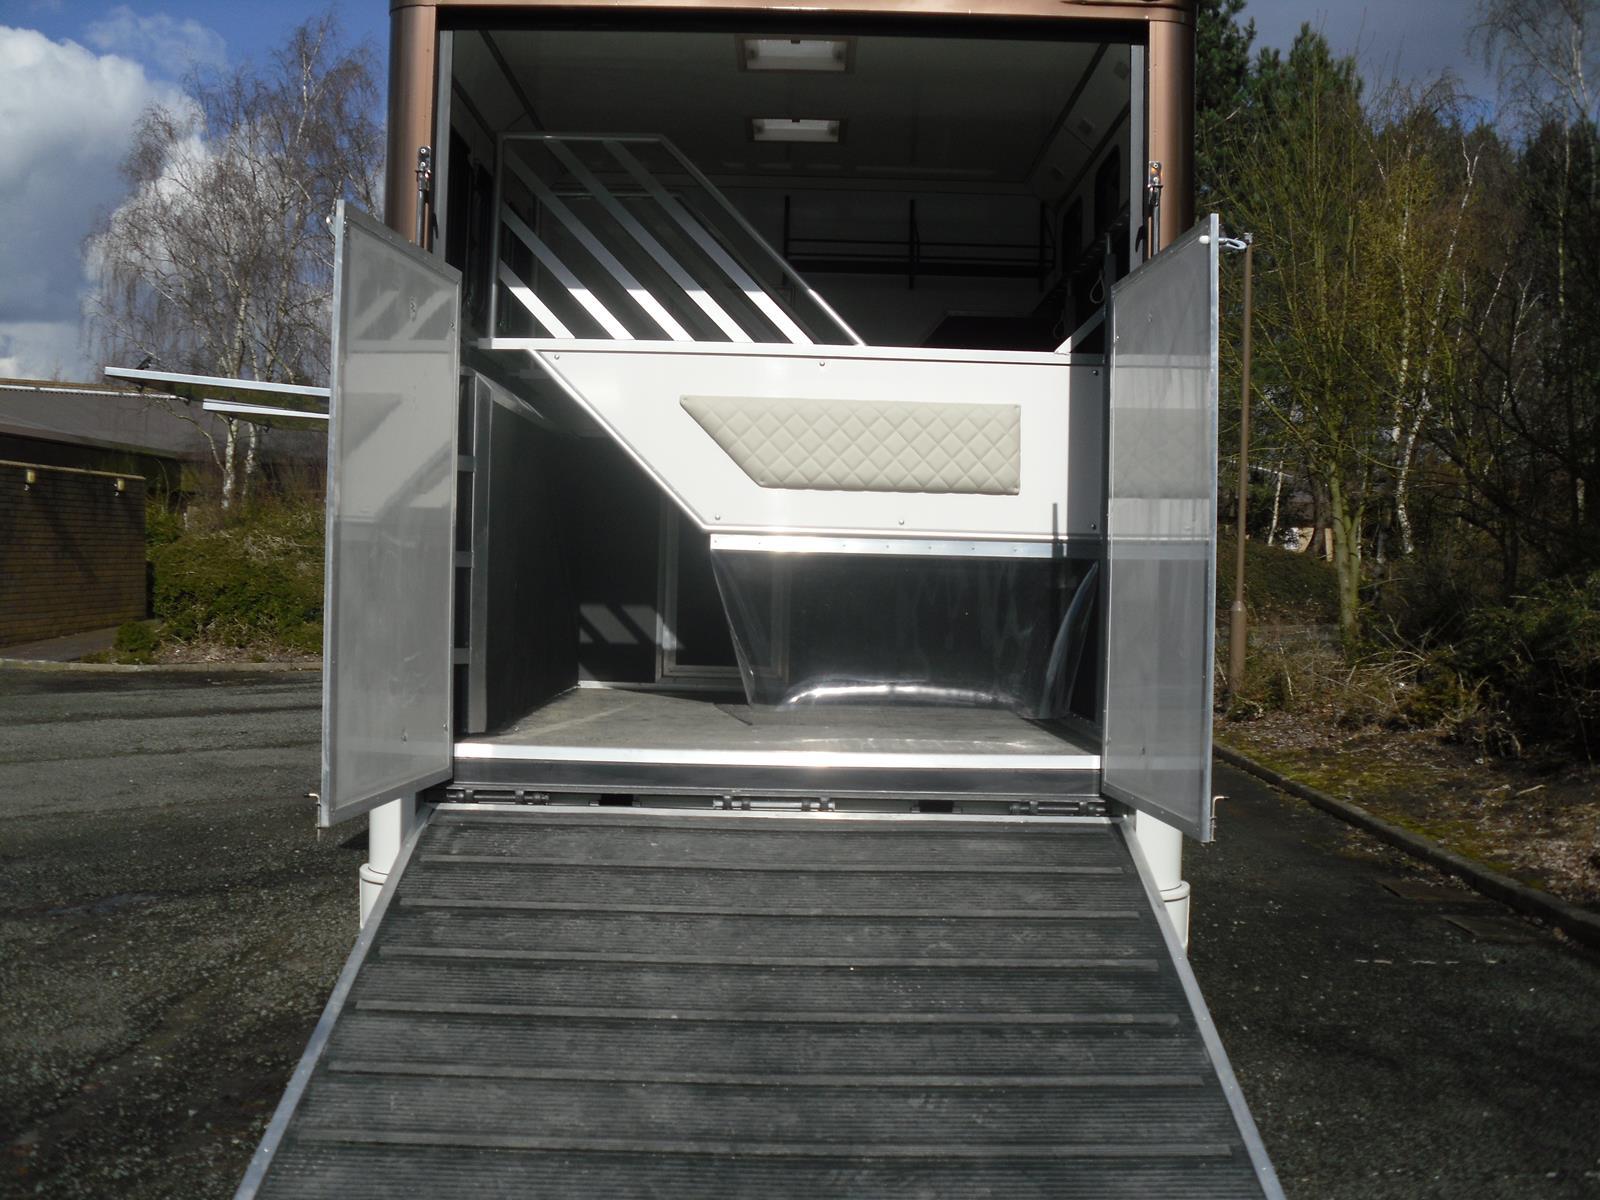 2006 Renault Midlam 7 5 Ton New Coach Build 2013 Horsebox